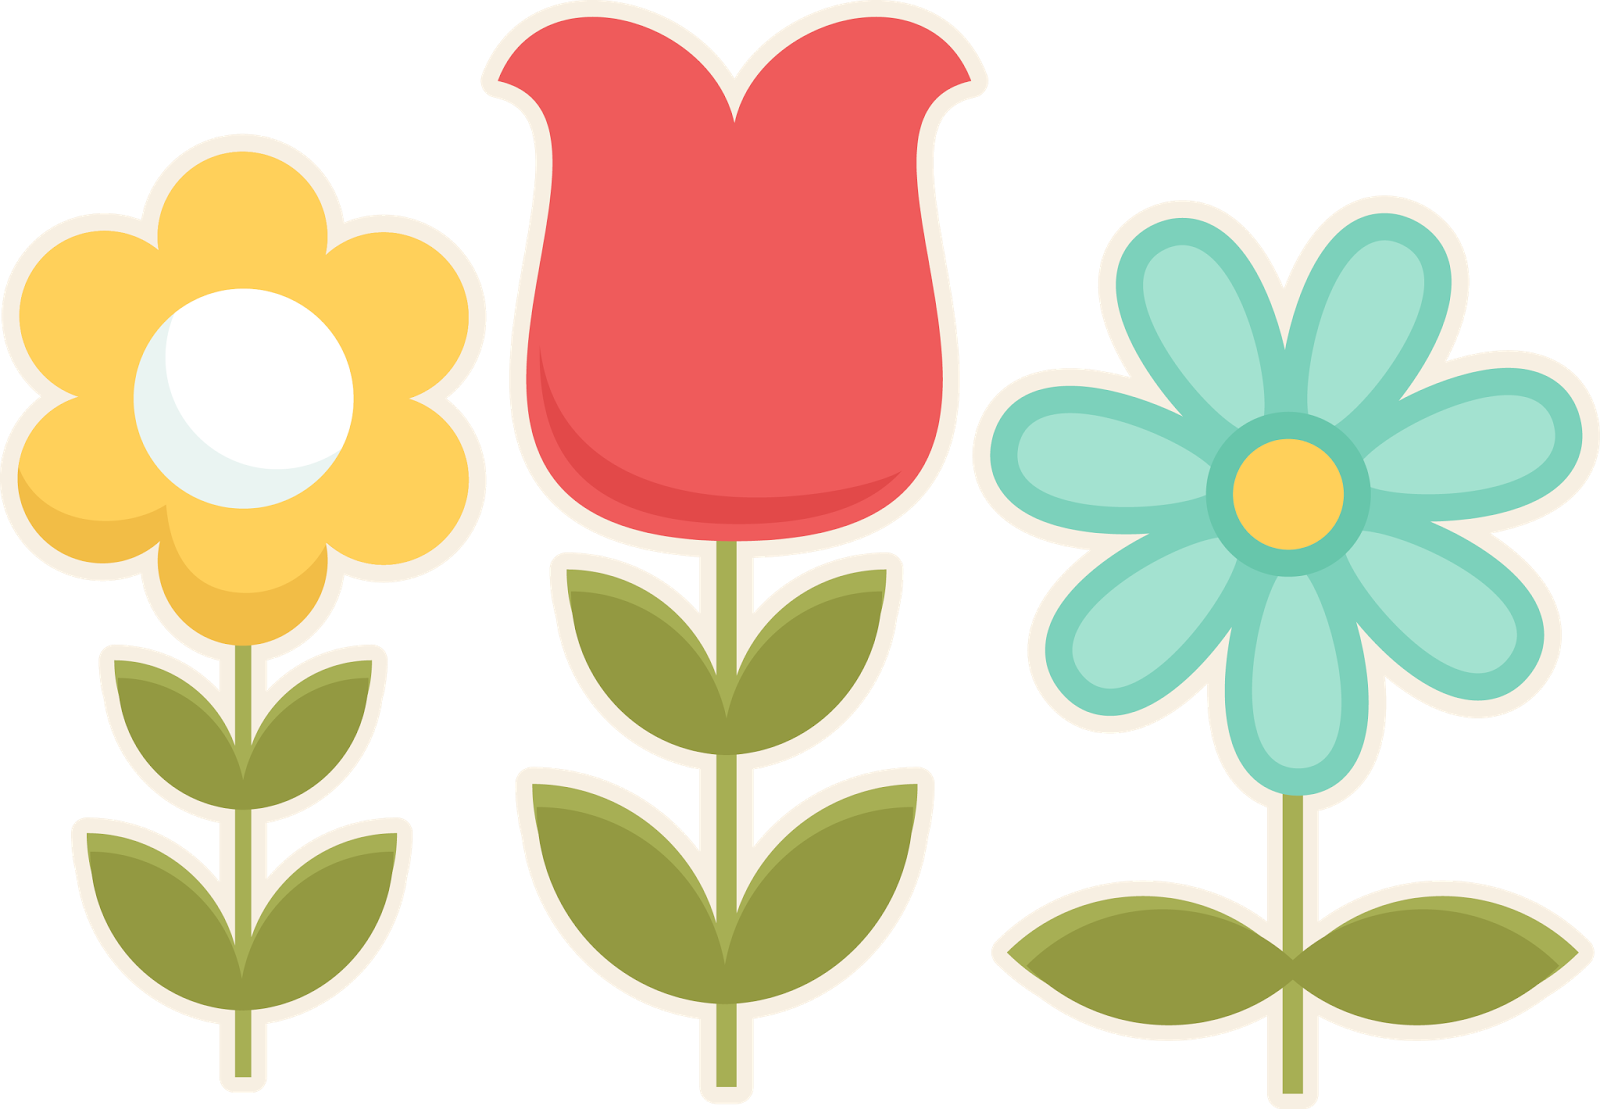 Mason jar blue flower clipart graphic royalty free library SPRING FLOWERS CLIP ART | CLIP ART - SPRING - CLIPART | Pinterest ... graphic royalty free library